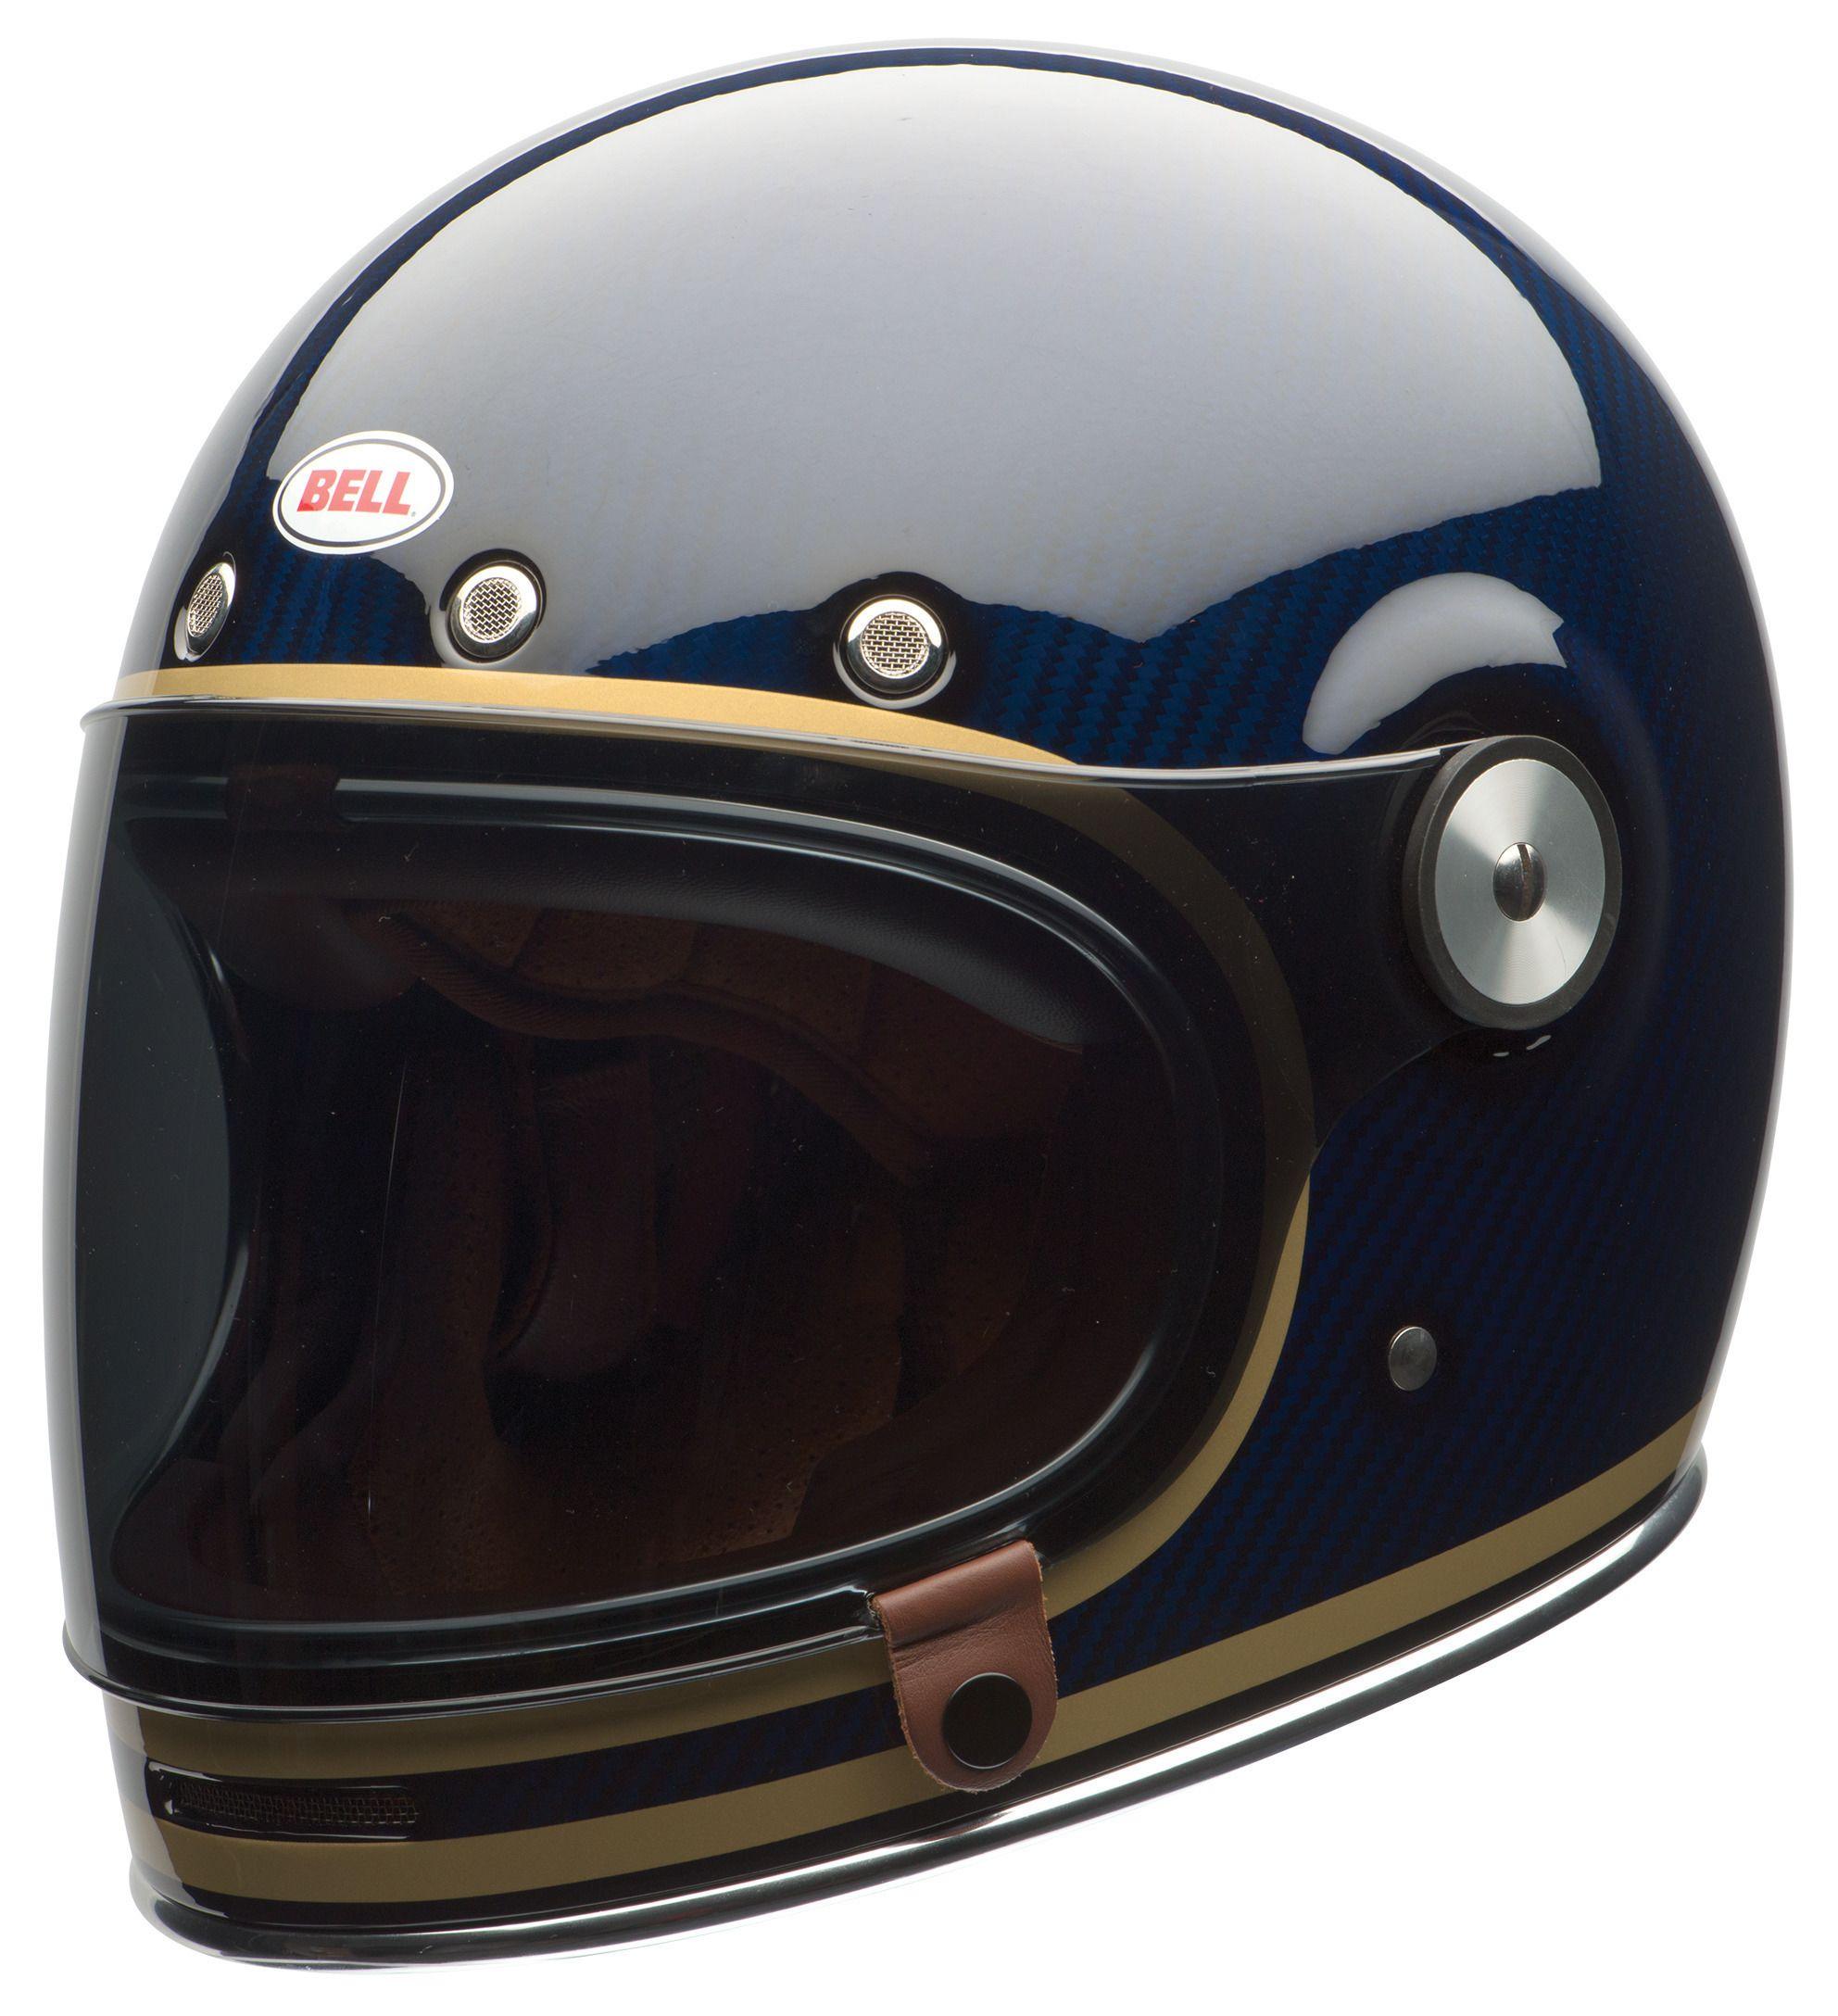 Bell Dual Sport Helmet >> Bell Bullitt Carbon LE Helmet - RevZilla